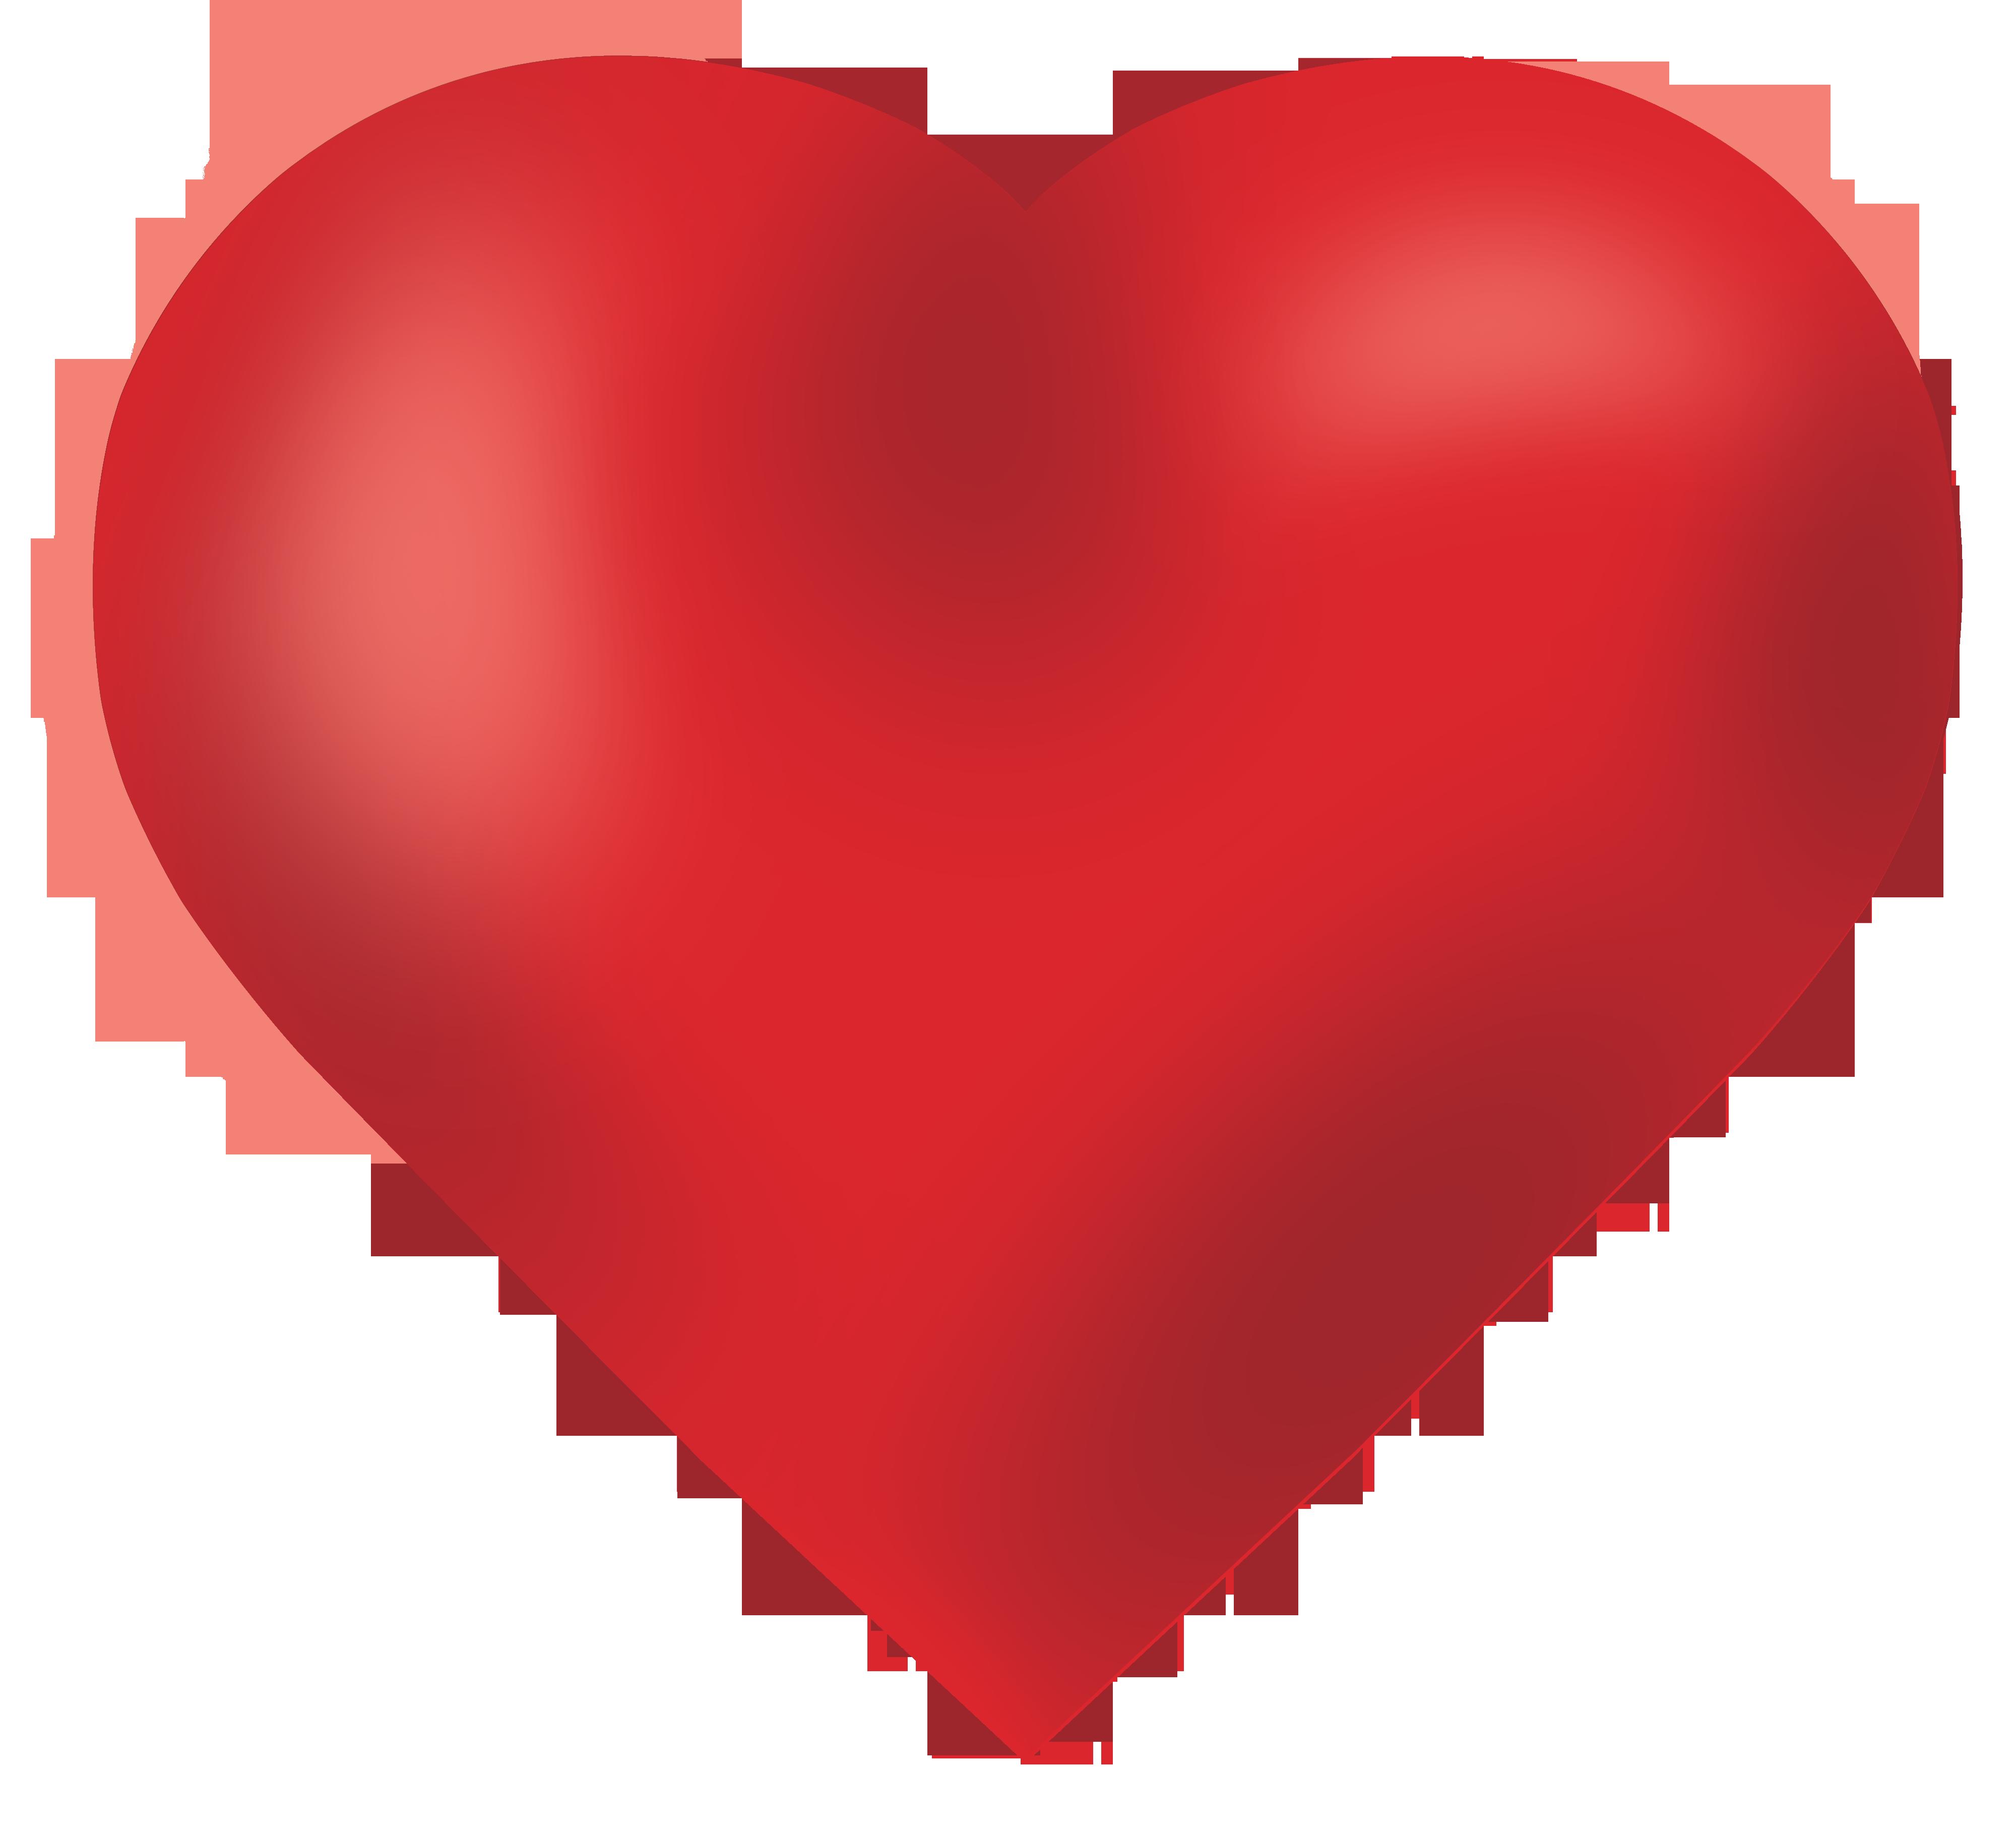 Love heart image png 8067 Free Transparent PNG Logos